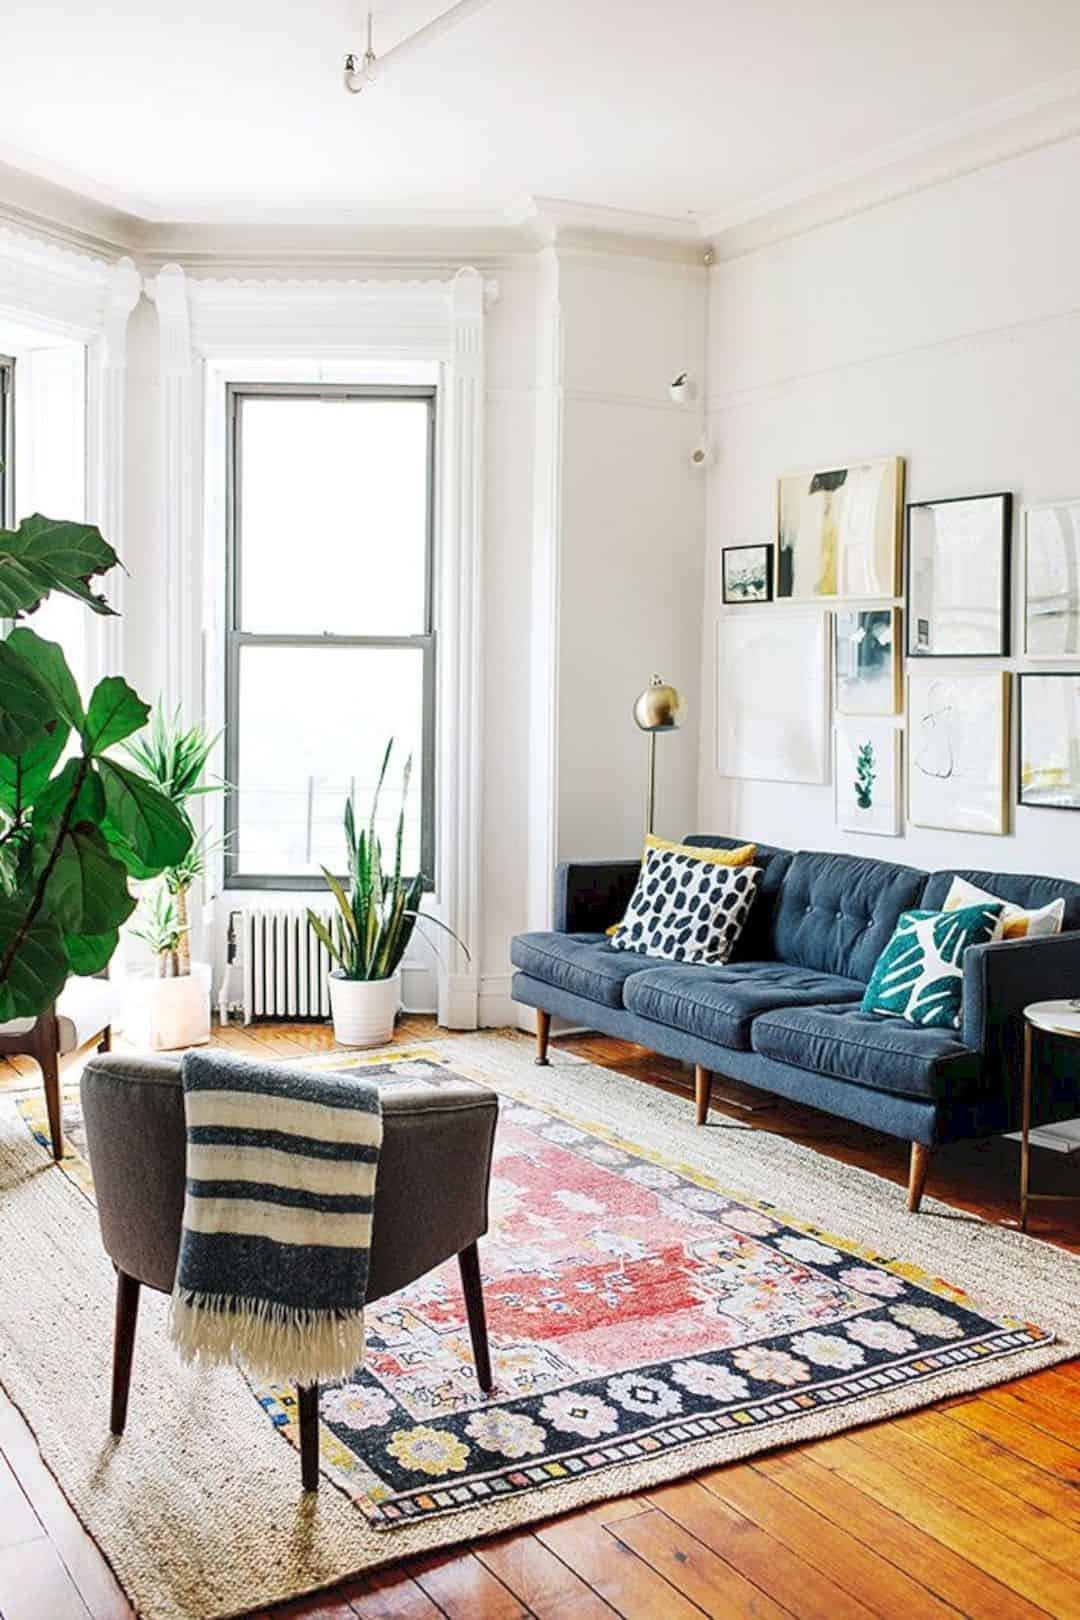 Small Living Room Interior Design 20 Stunning Small Living Room Decorating Ideas